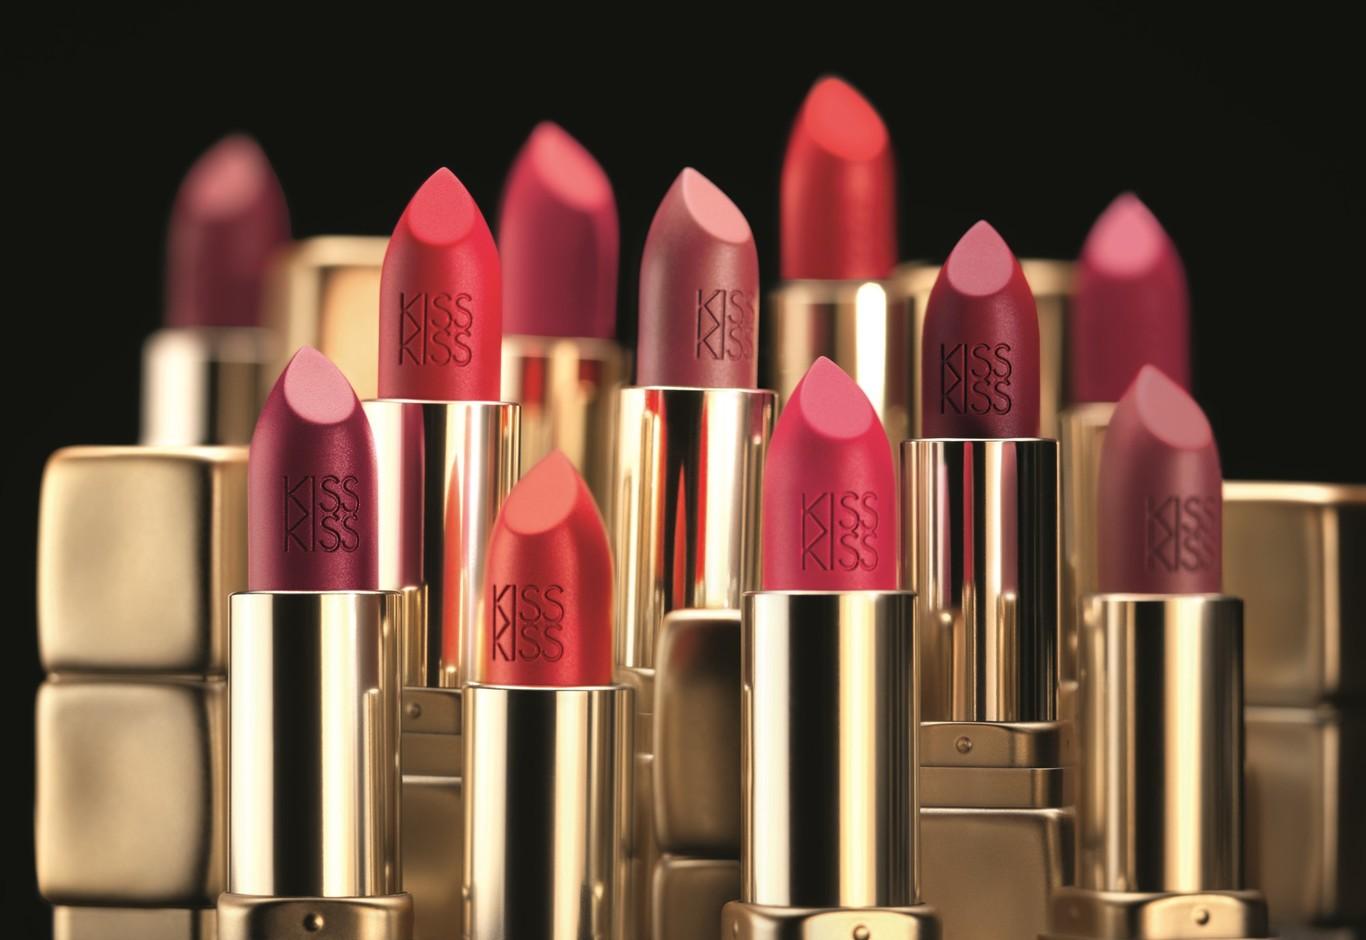 You'll want the whole Guerlain makeup line | Dress24h